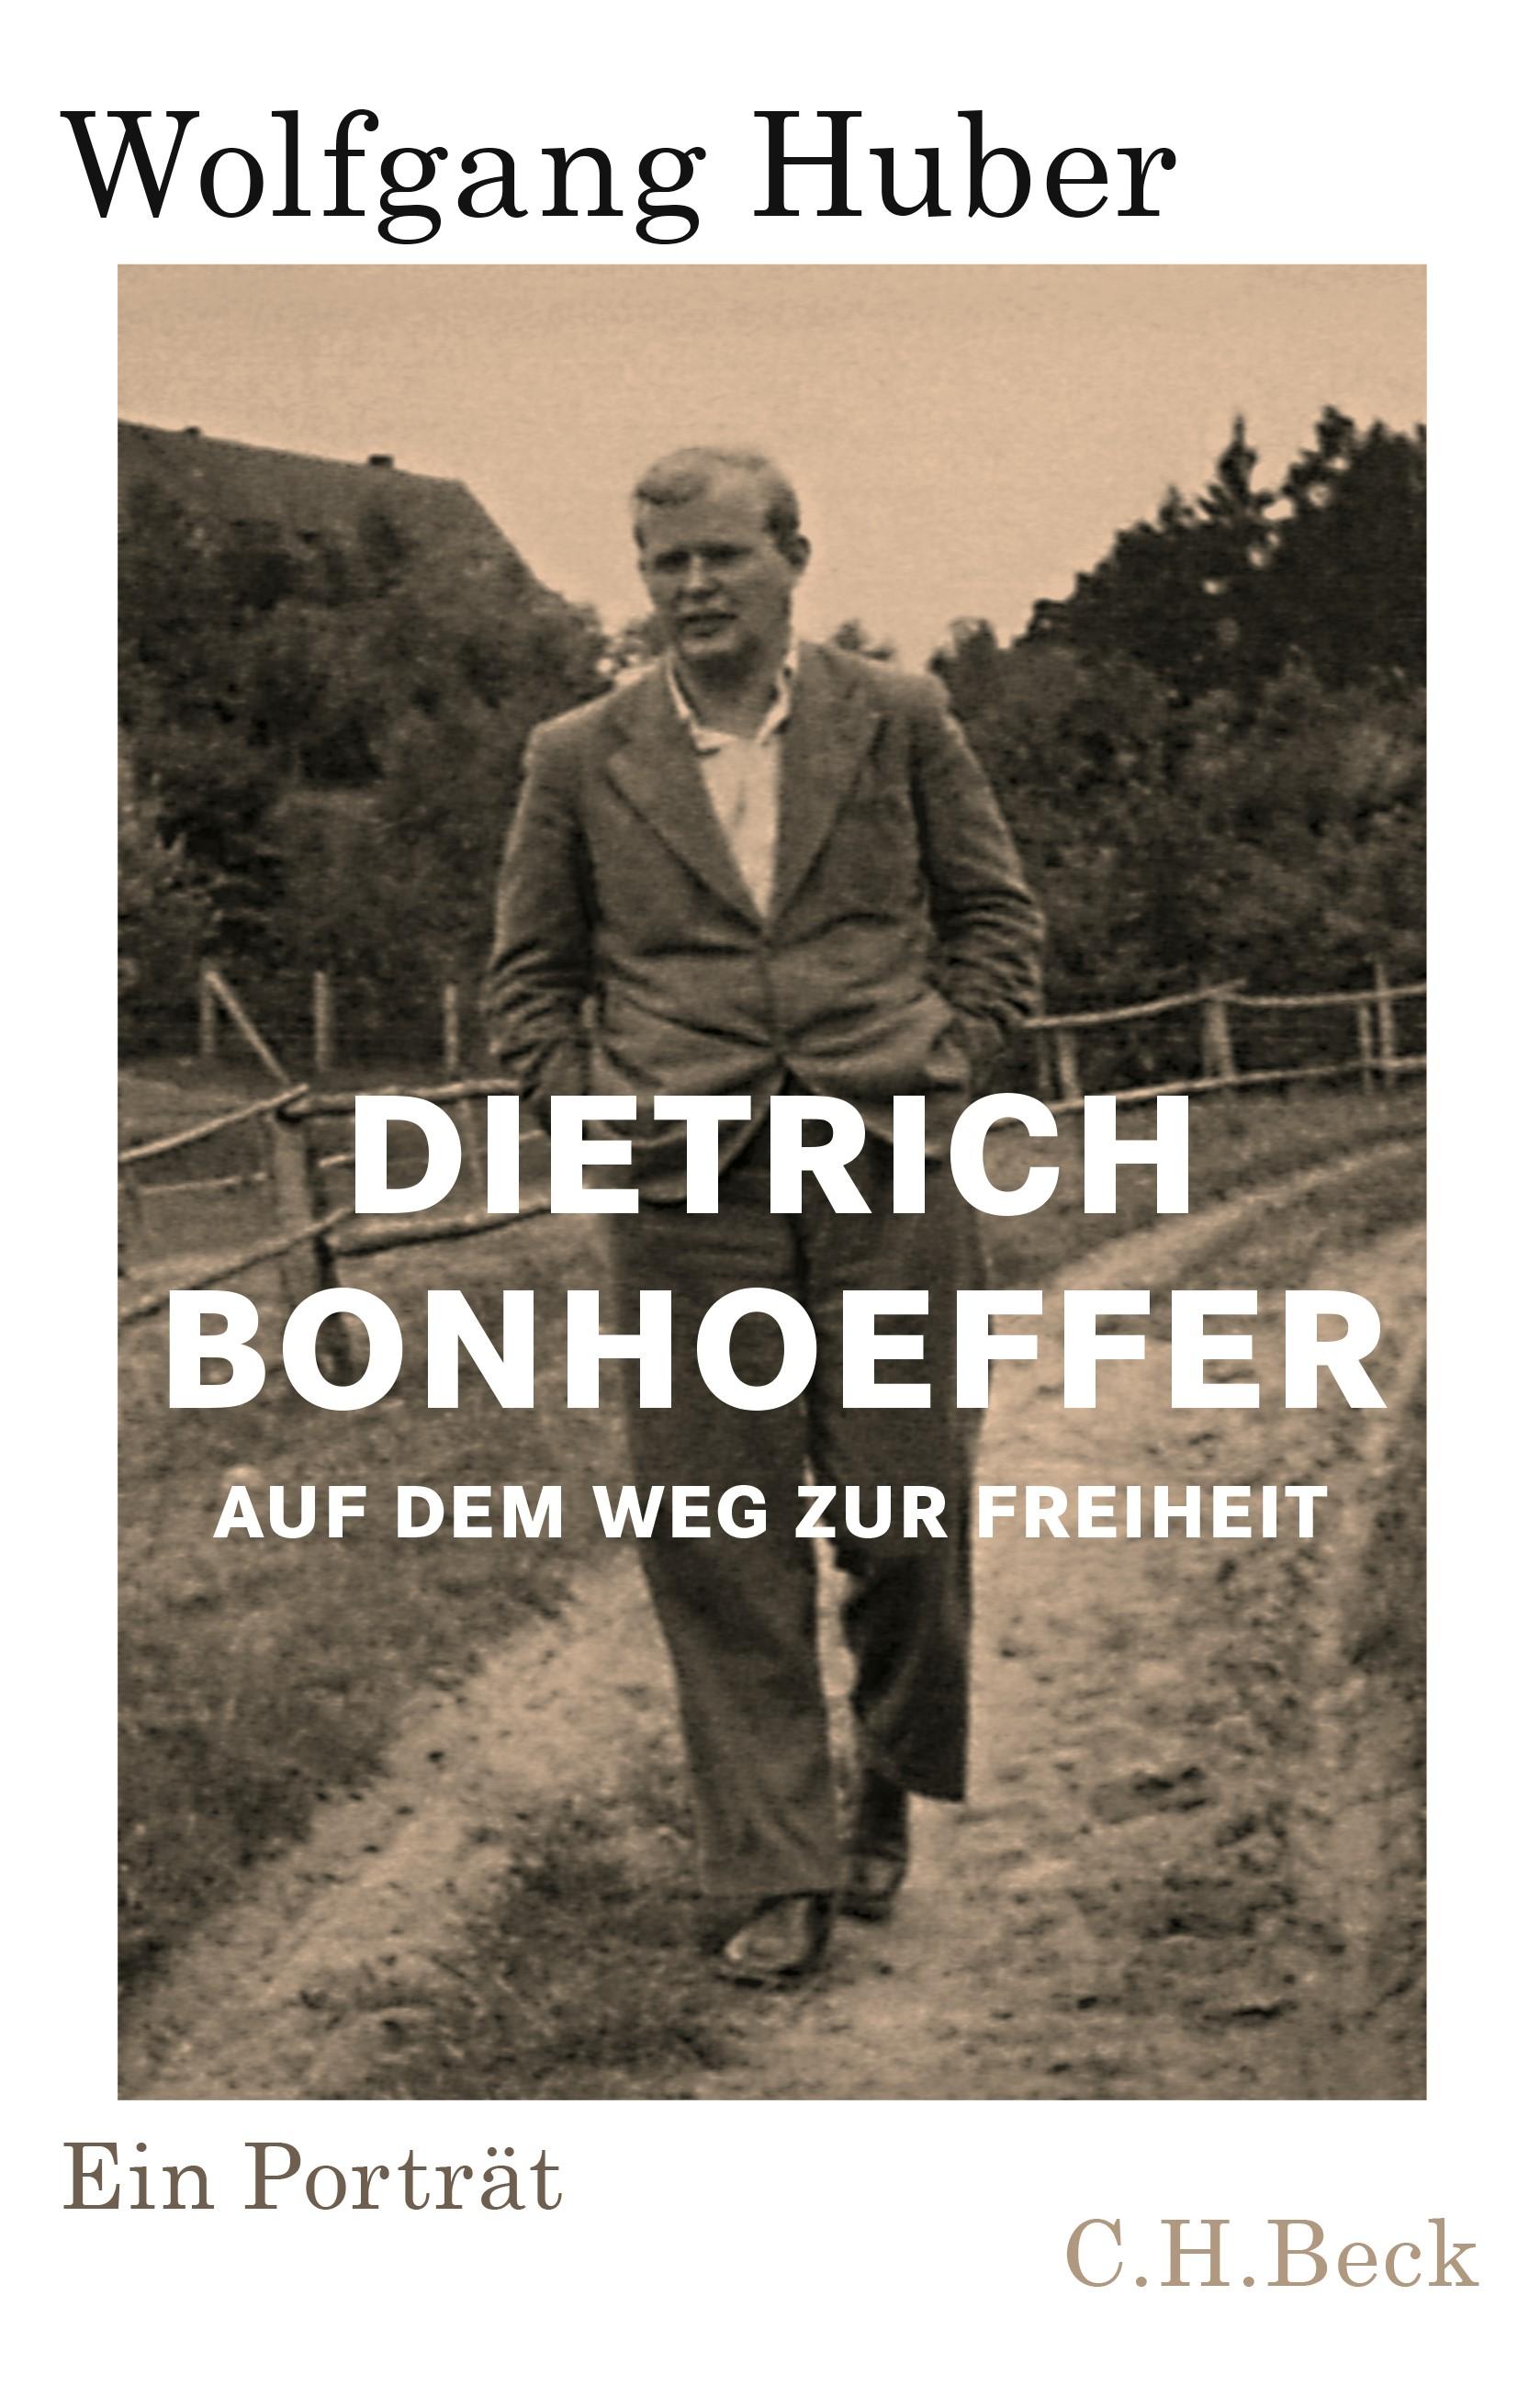 Dietrich Bonhoeffer | Huber, Wolfgang, 2019 | Buch (Cover)